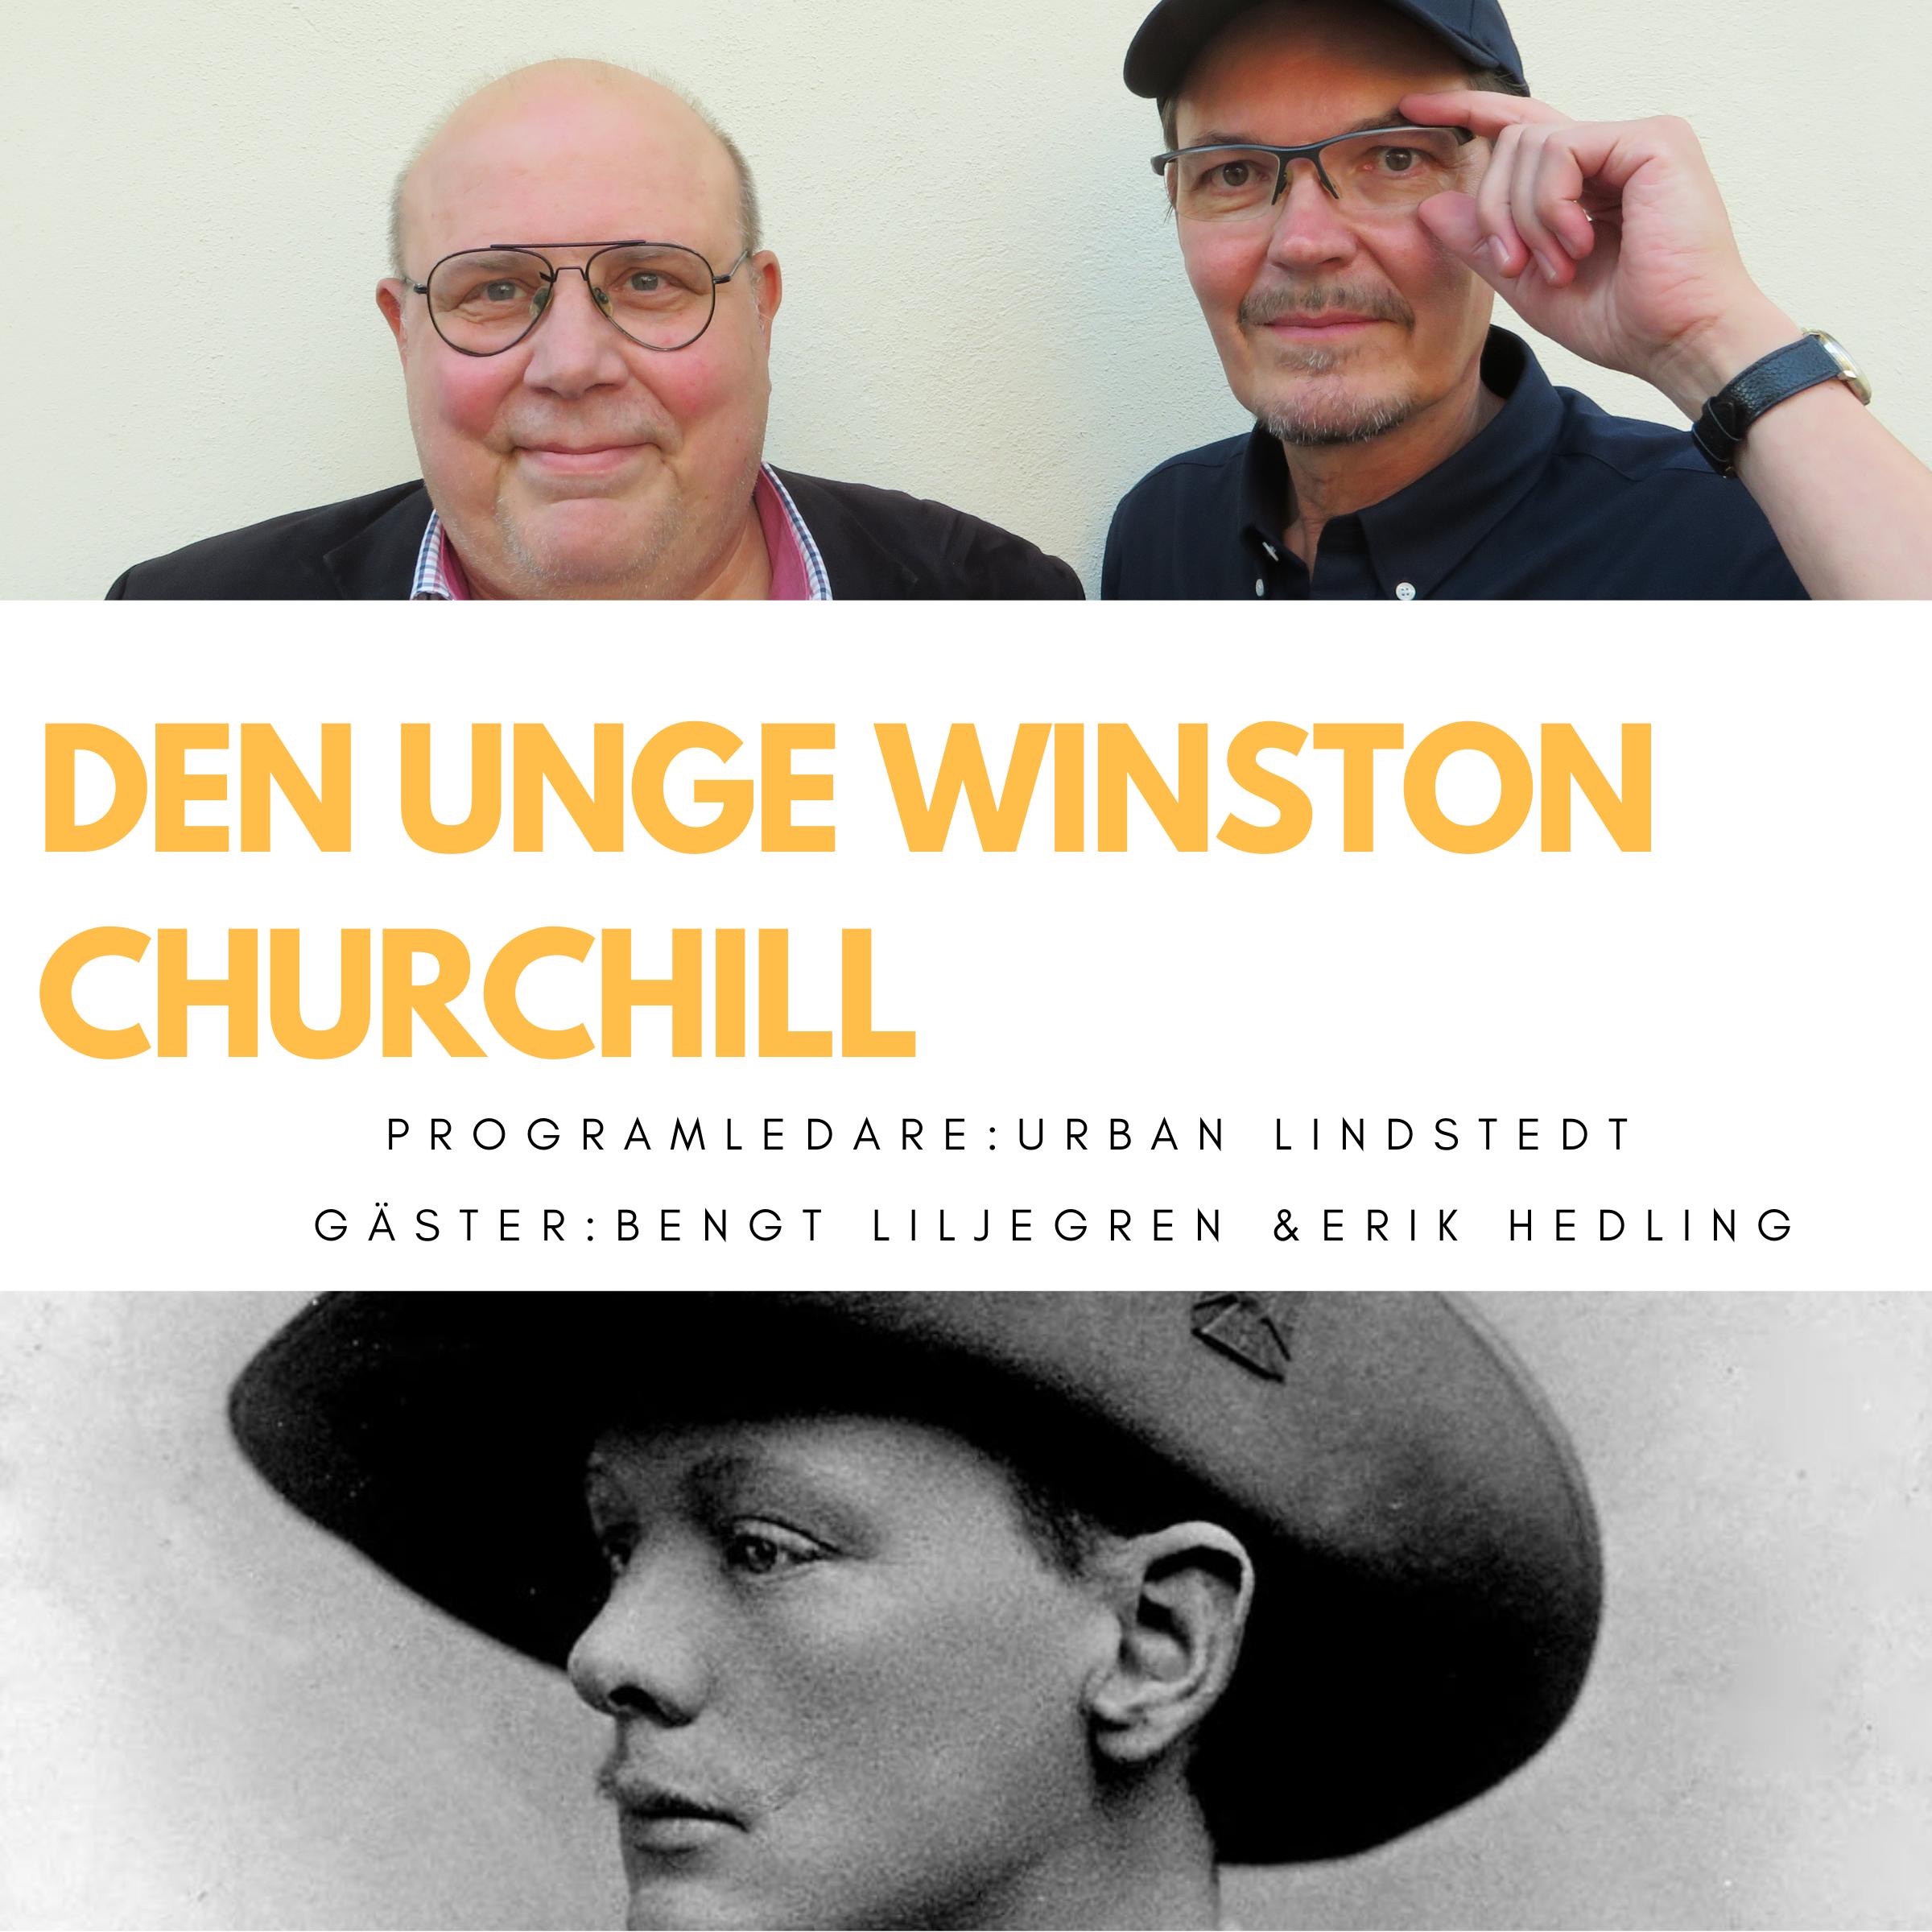 Ingen lyckades kuva den unge Winston Churchill (nymixad repris)